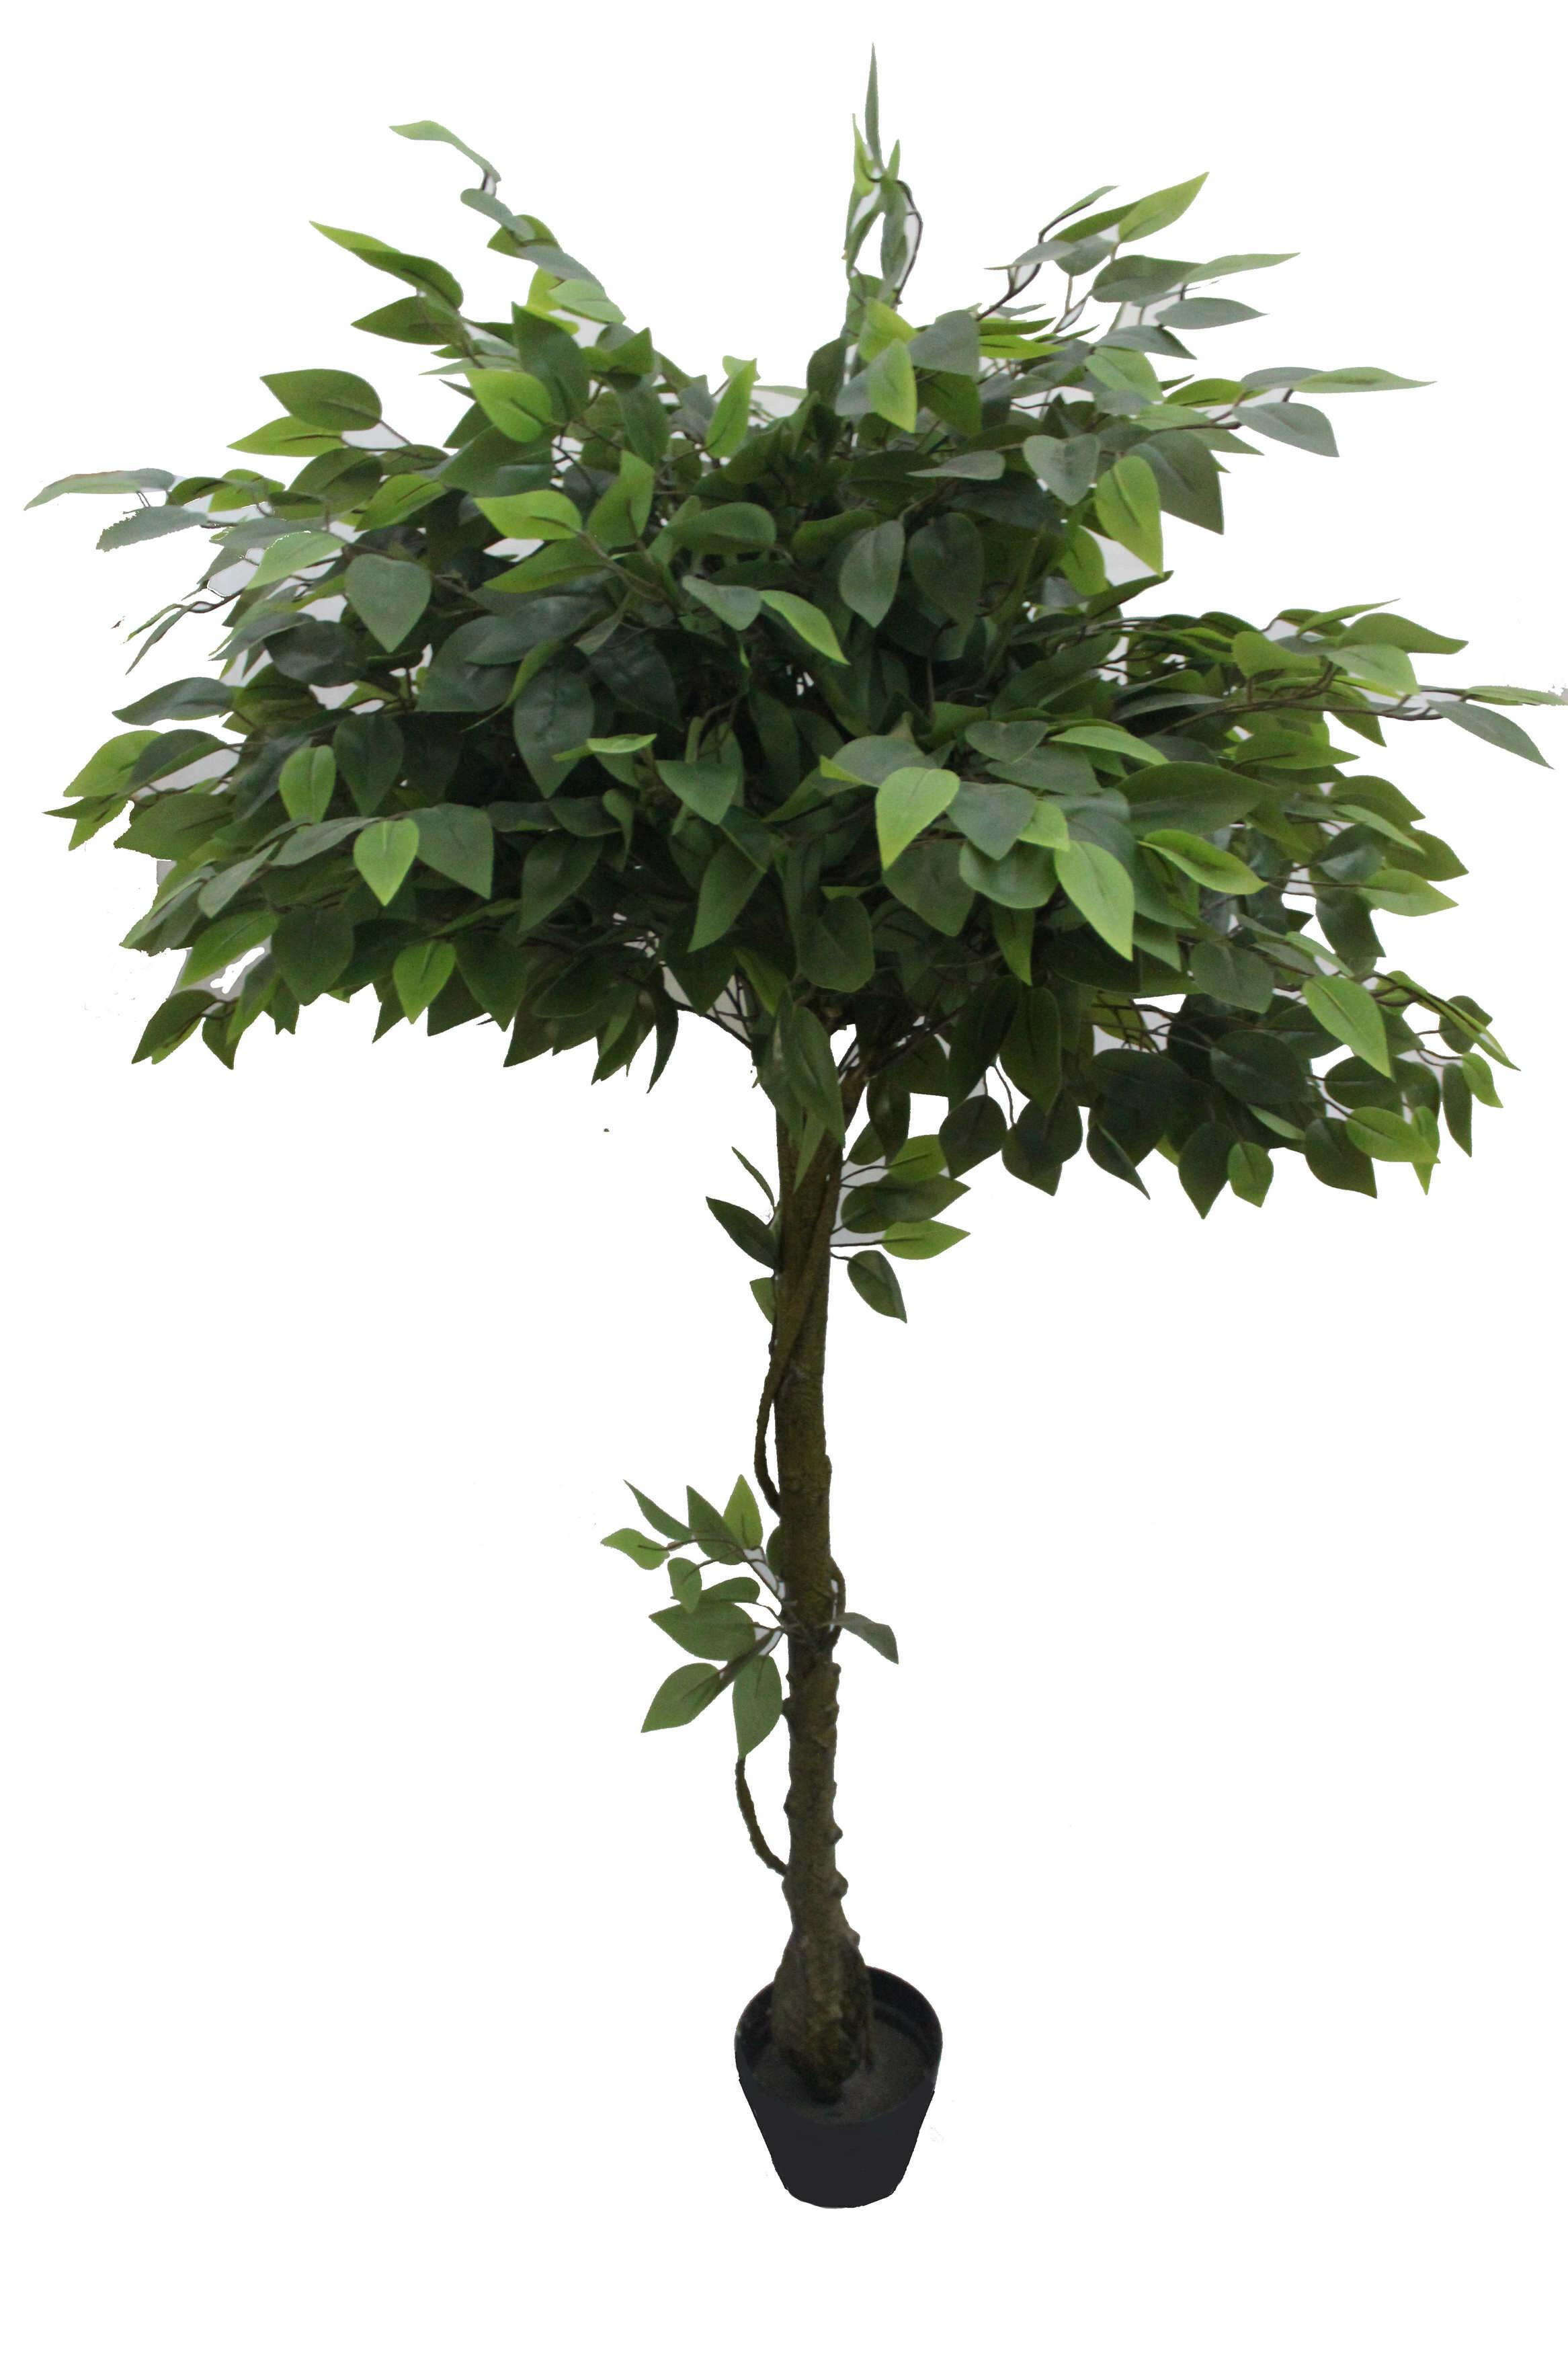 Darby Home Co Glossy Banyan Floor Ficus Tree In Pot Wayfair